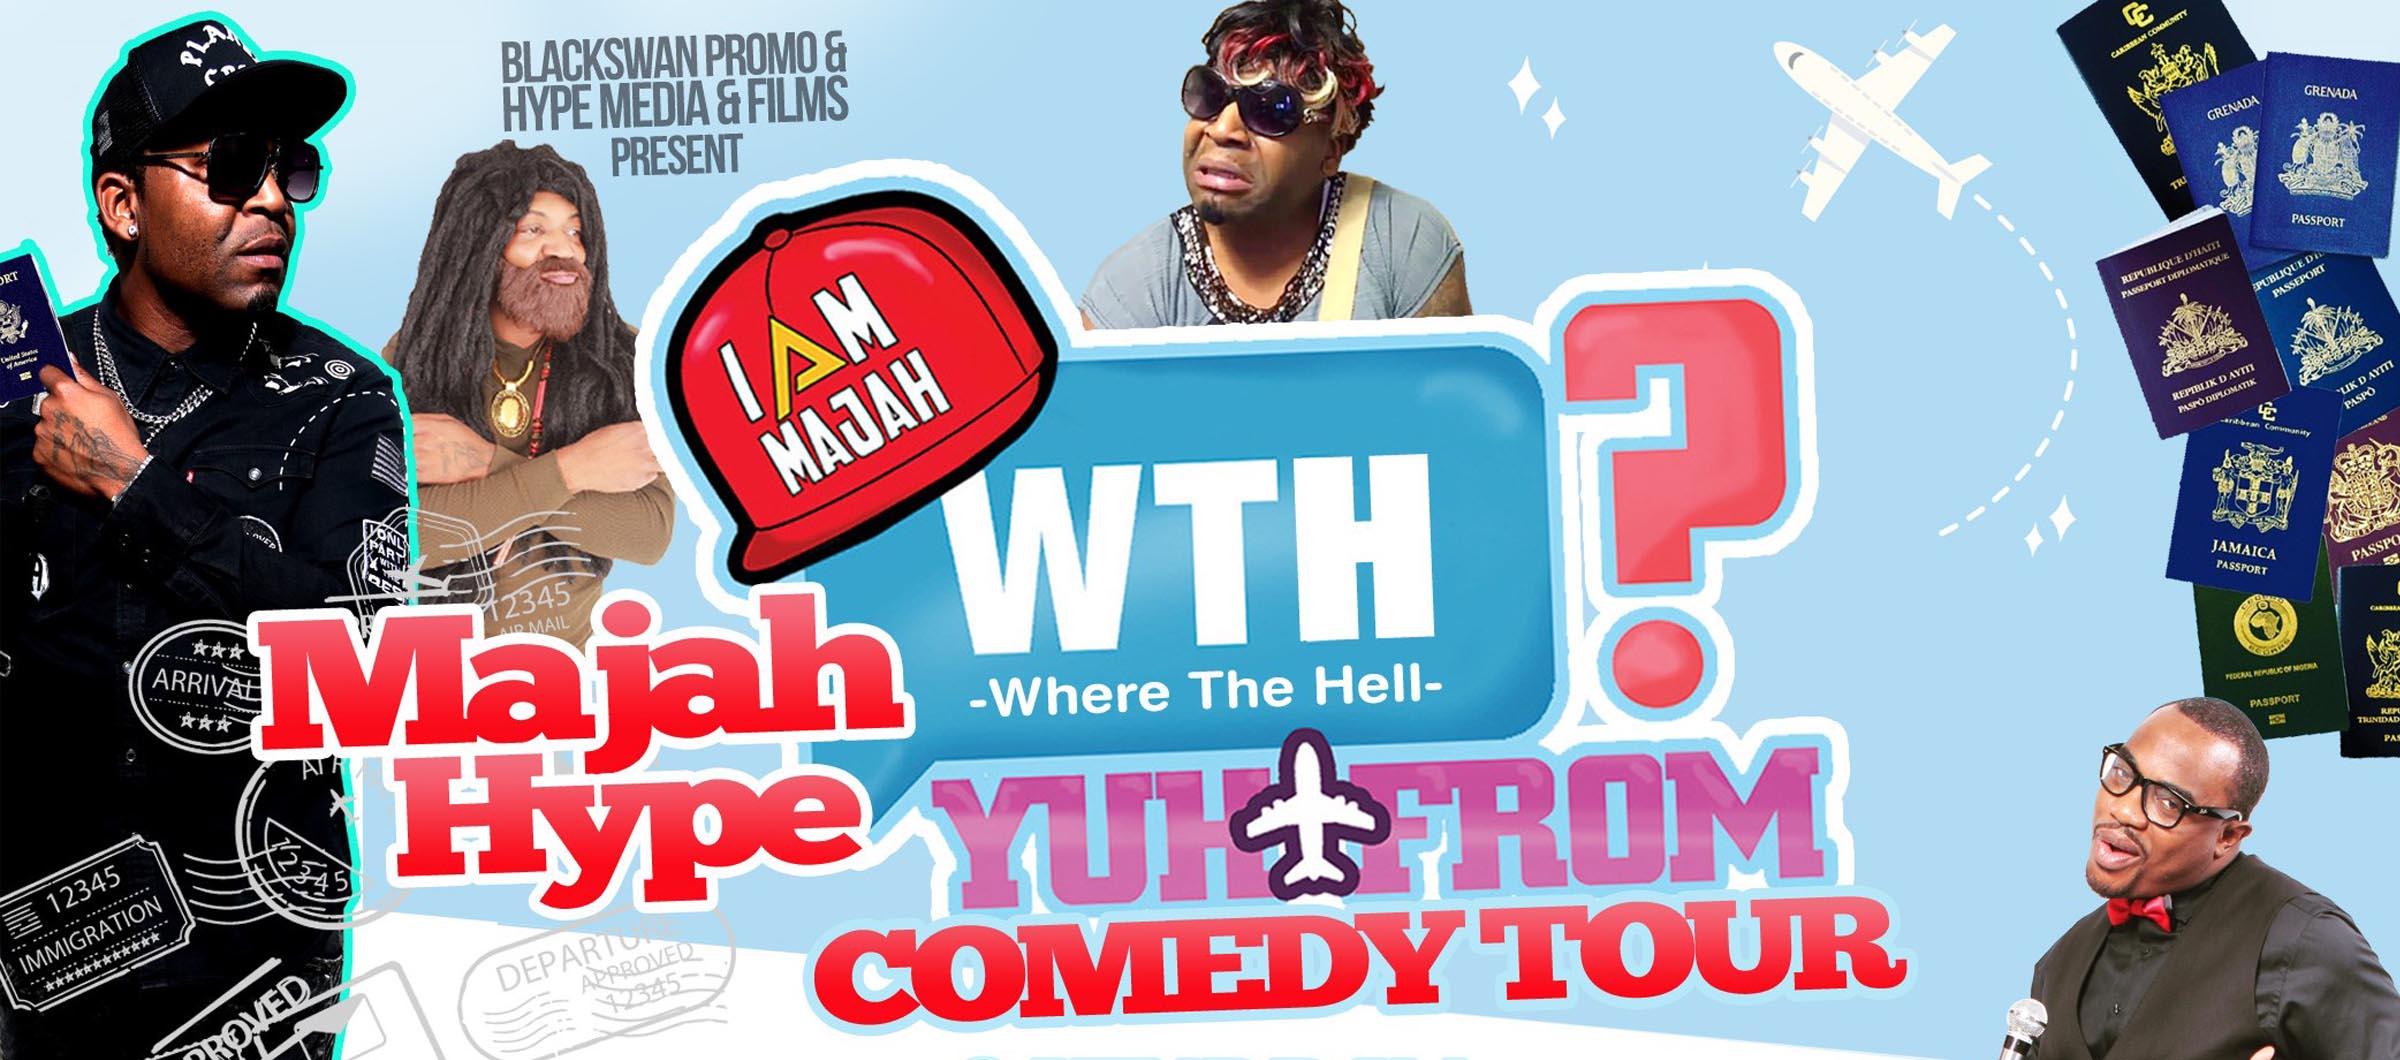 Majah Hype Comedy Tour